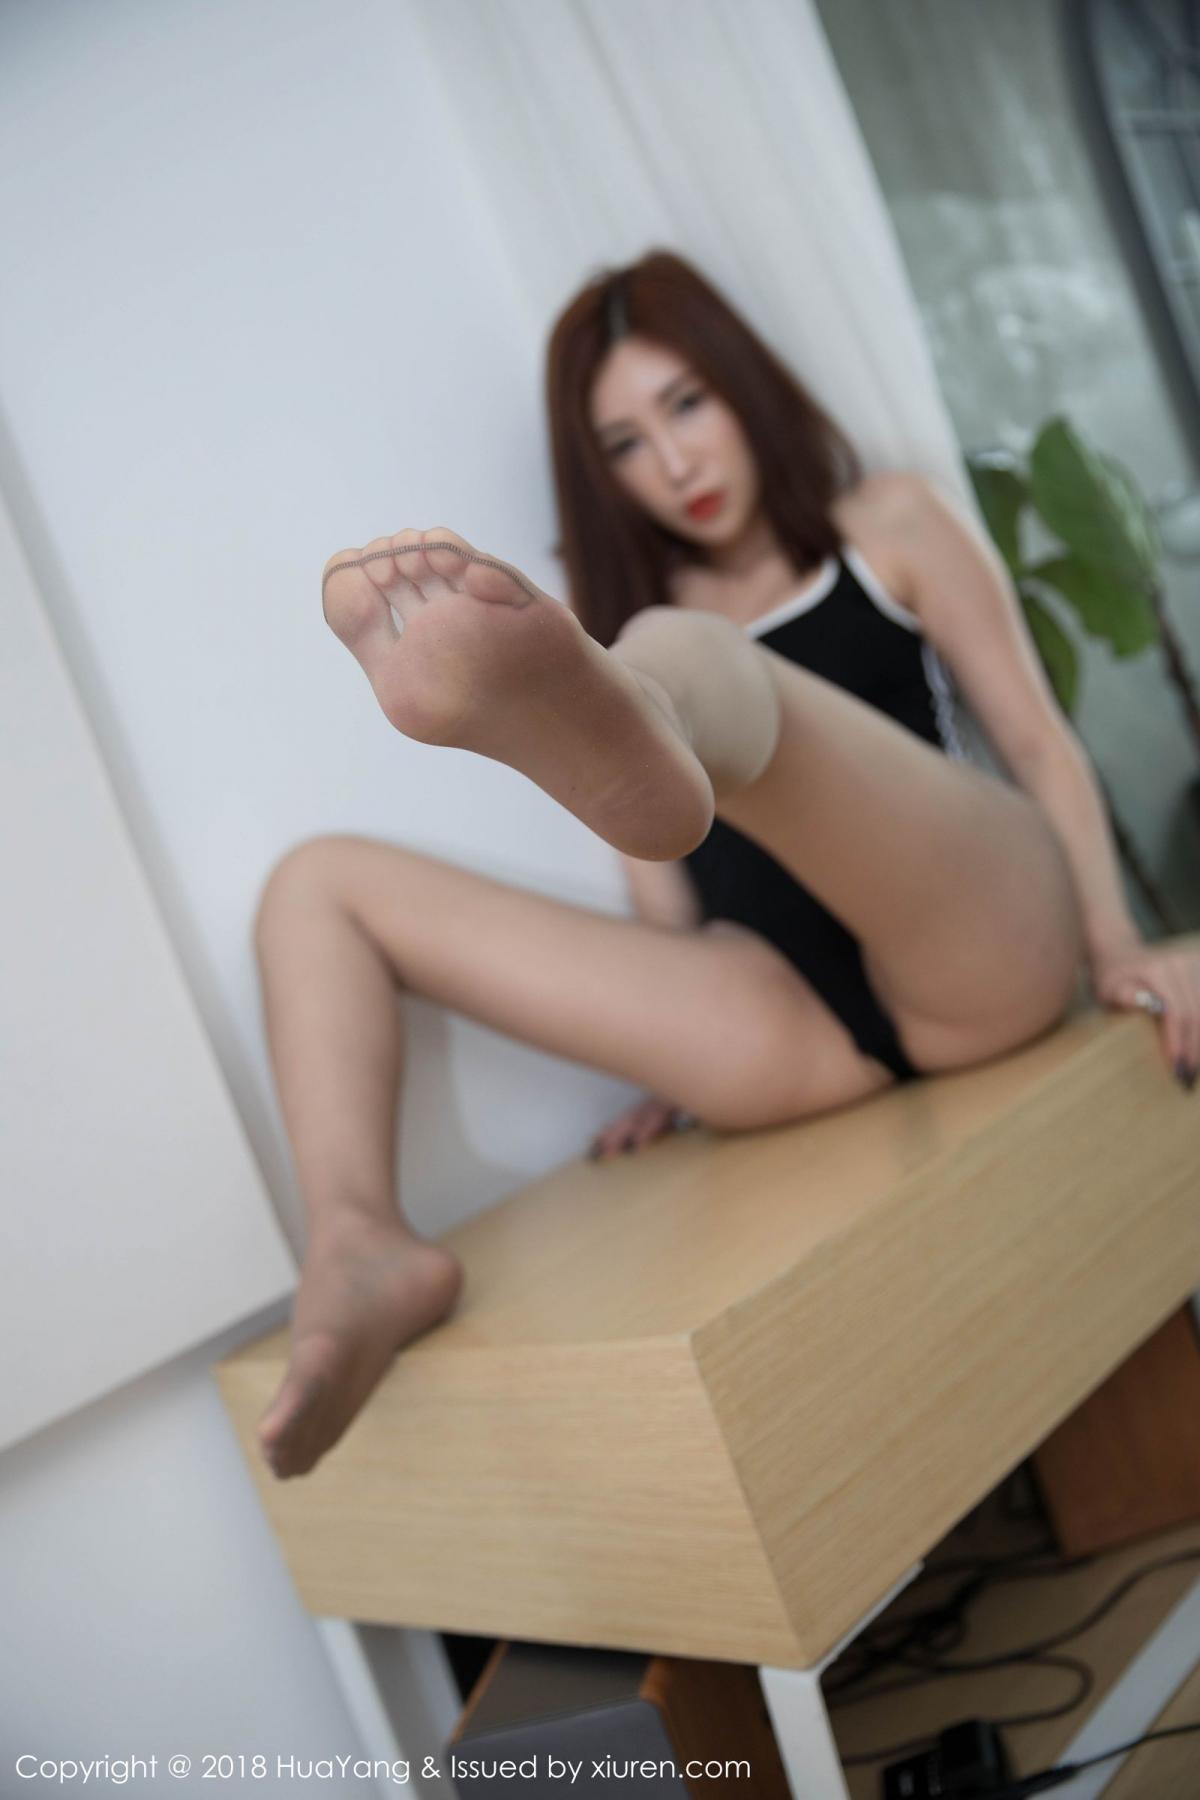 [Huayang] Vol.092 Sun Meng Yao 43P, HuaYang, Nurse, Sun Meng Yao, Tall, Uniform